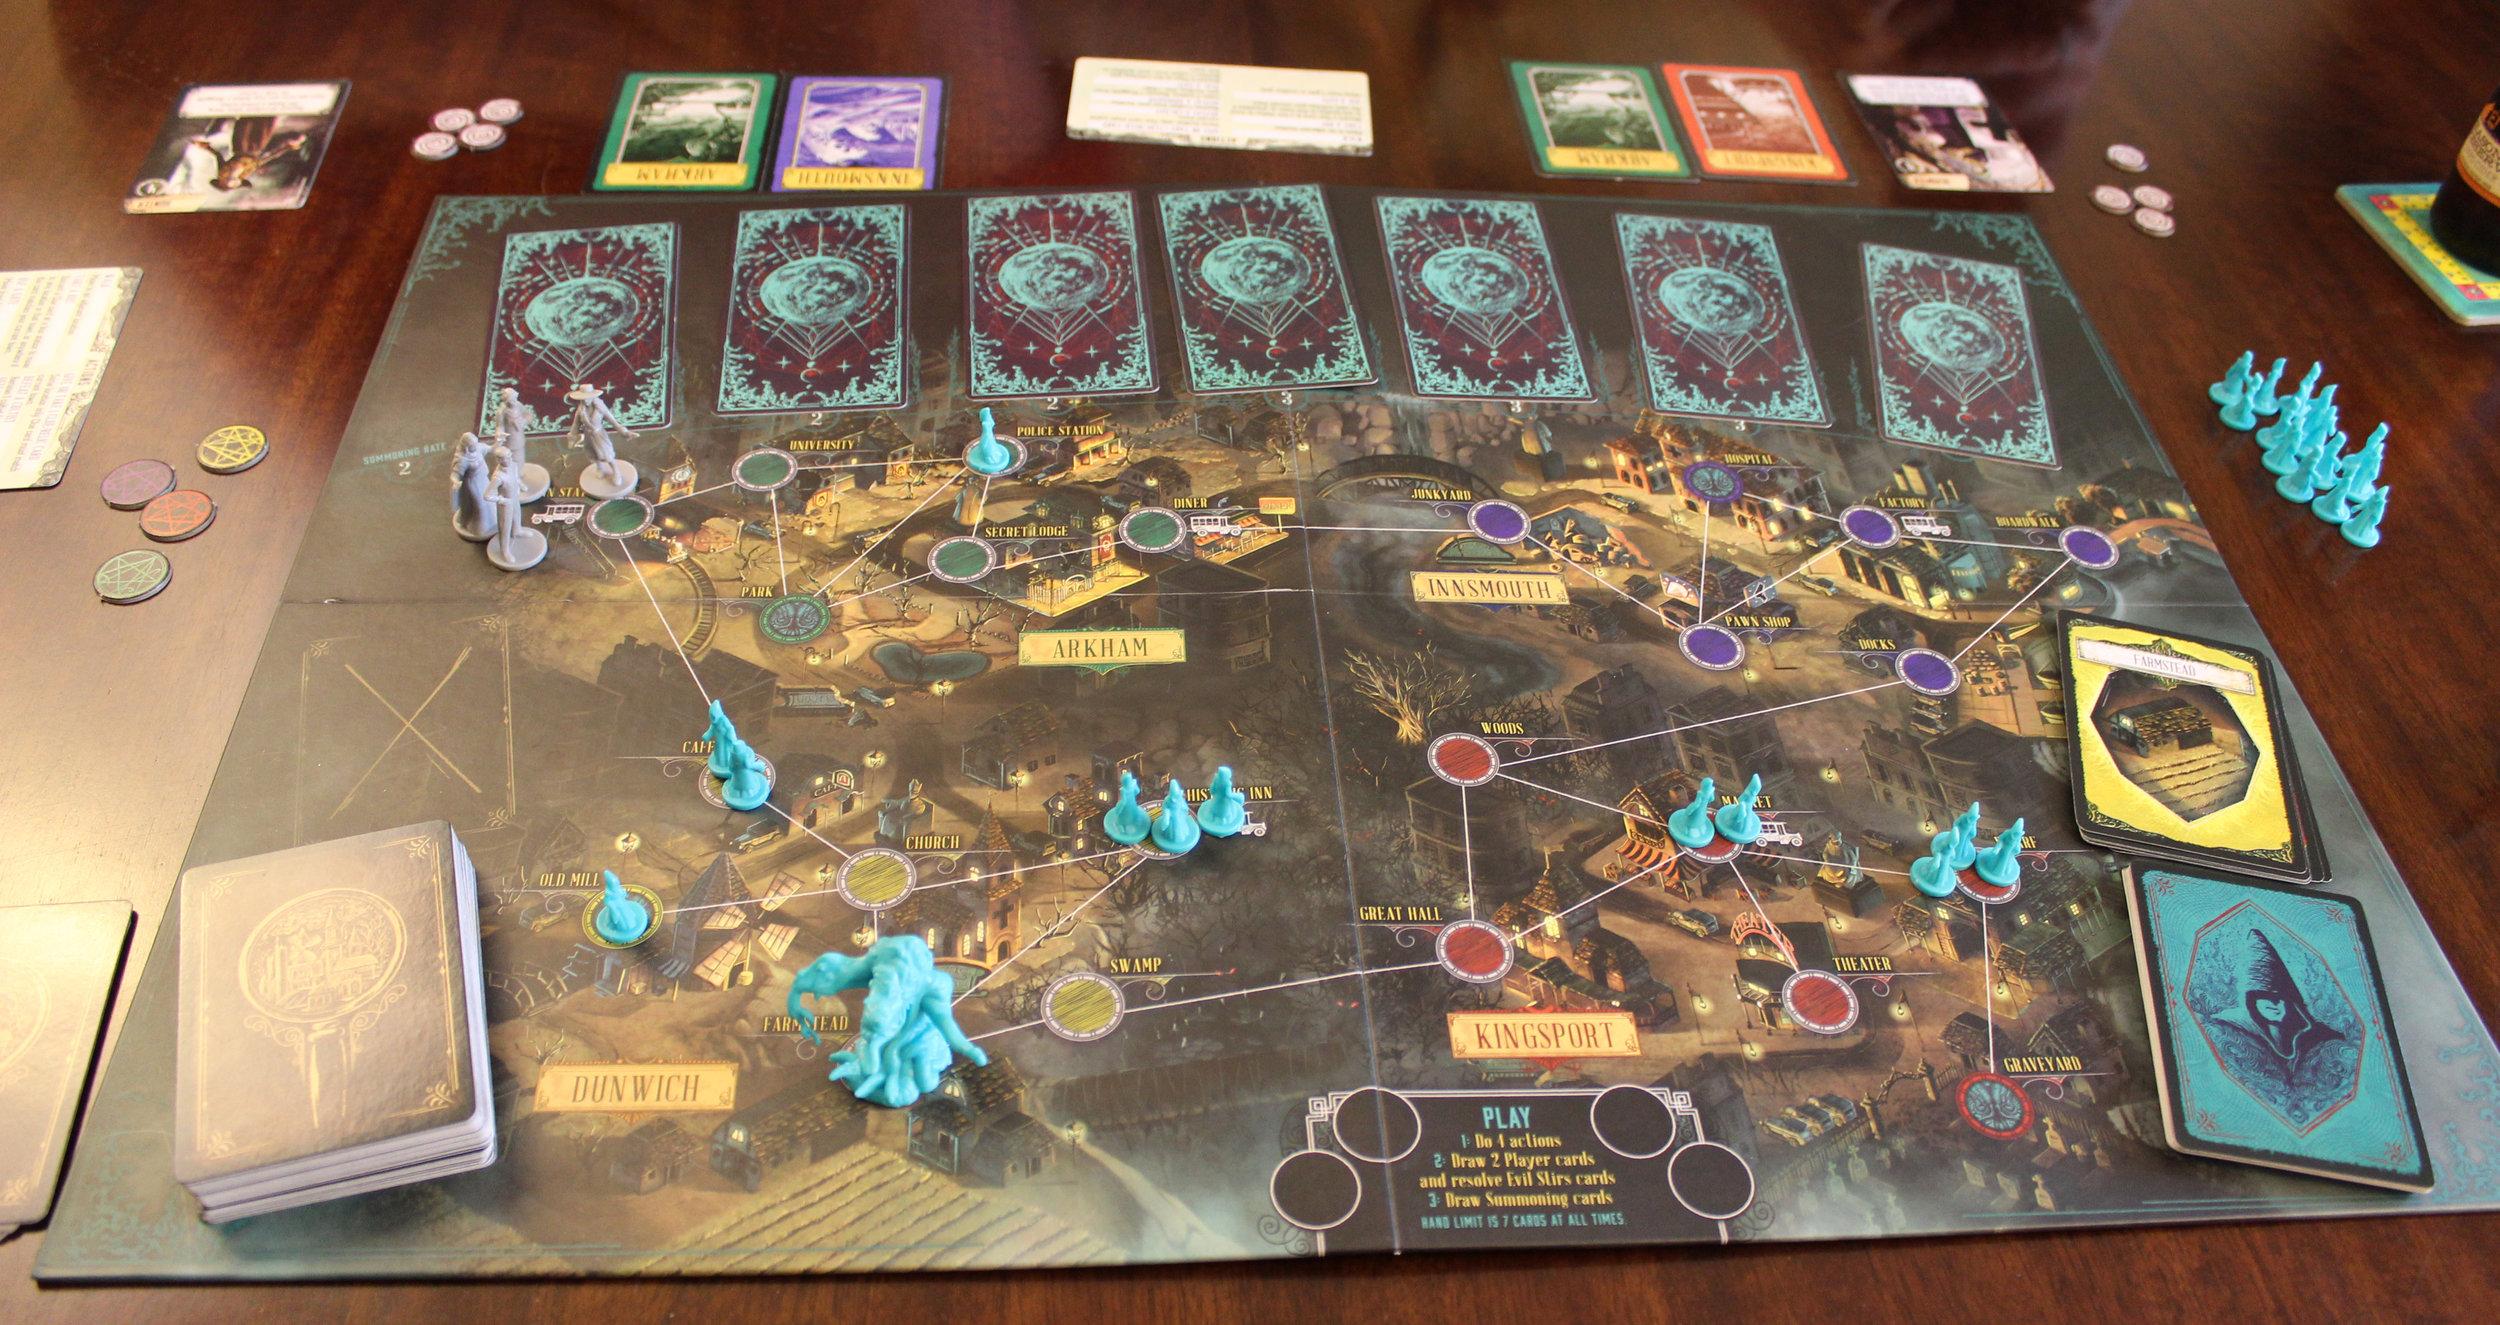 Game setup for four players.